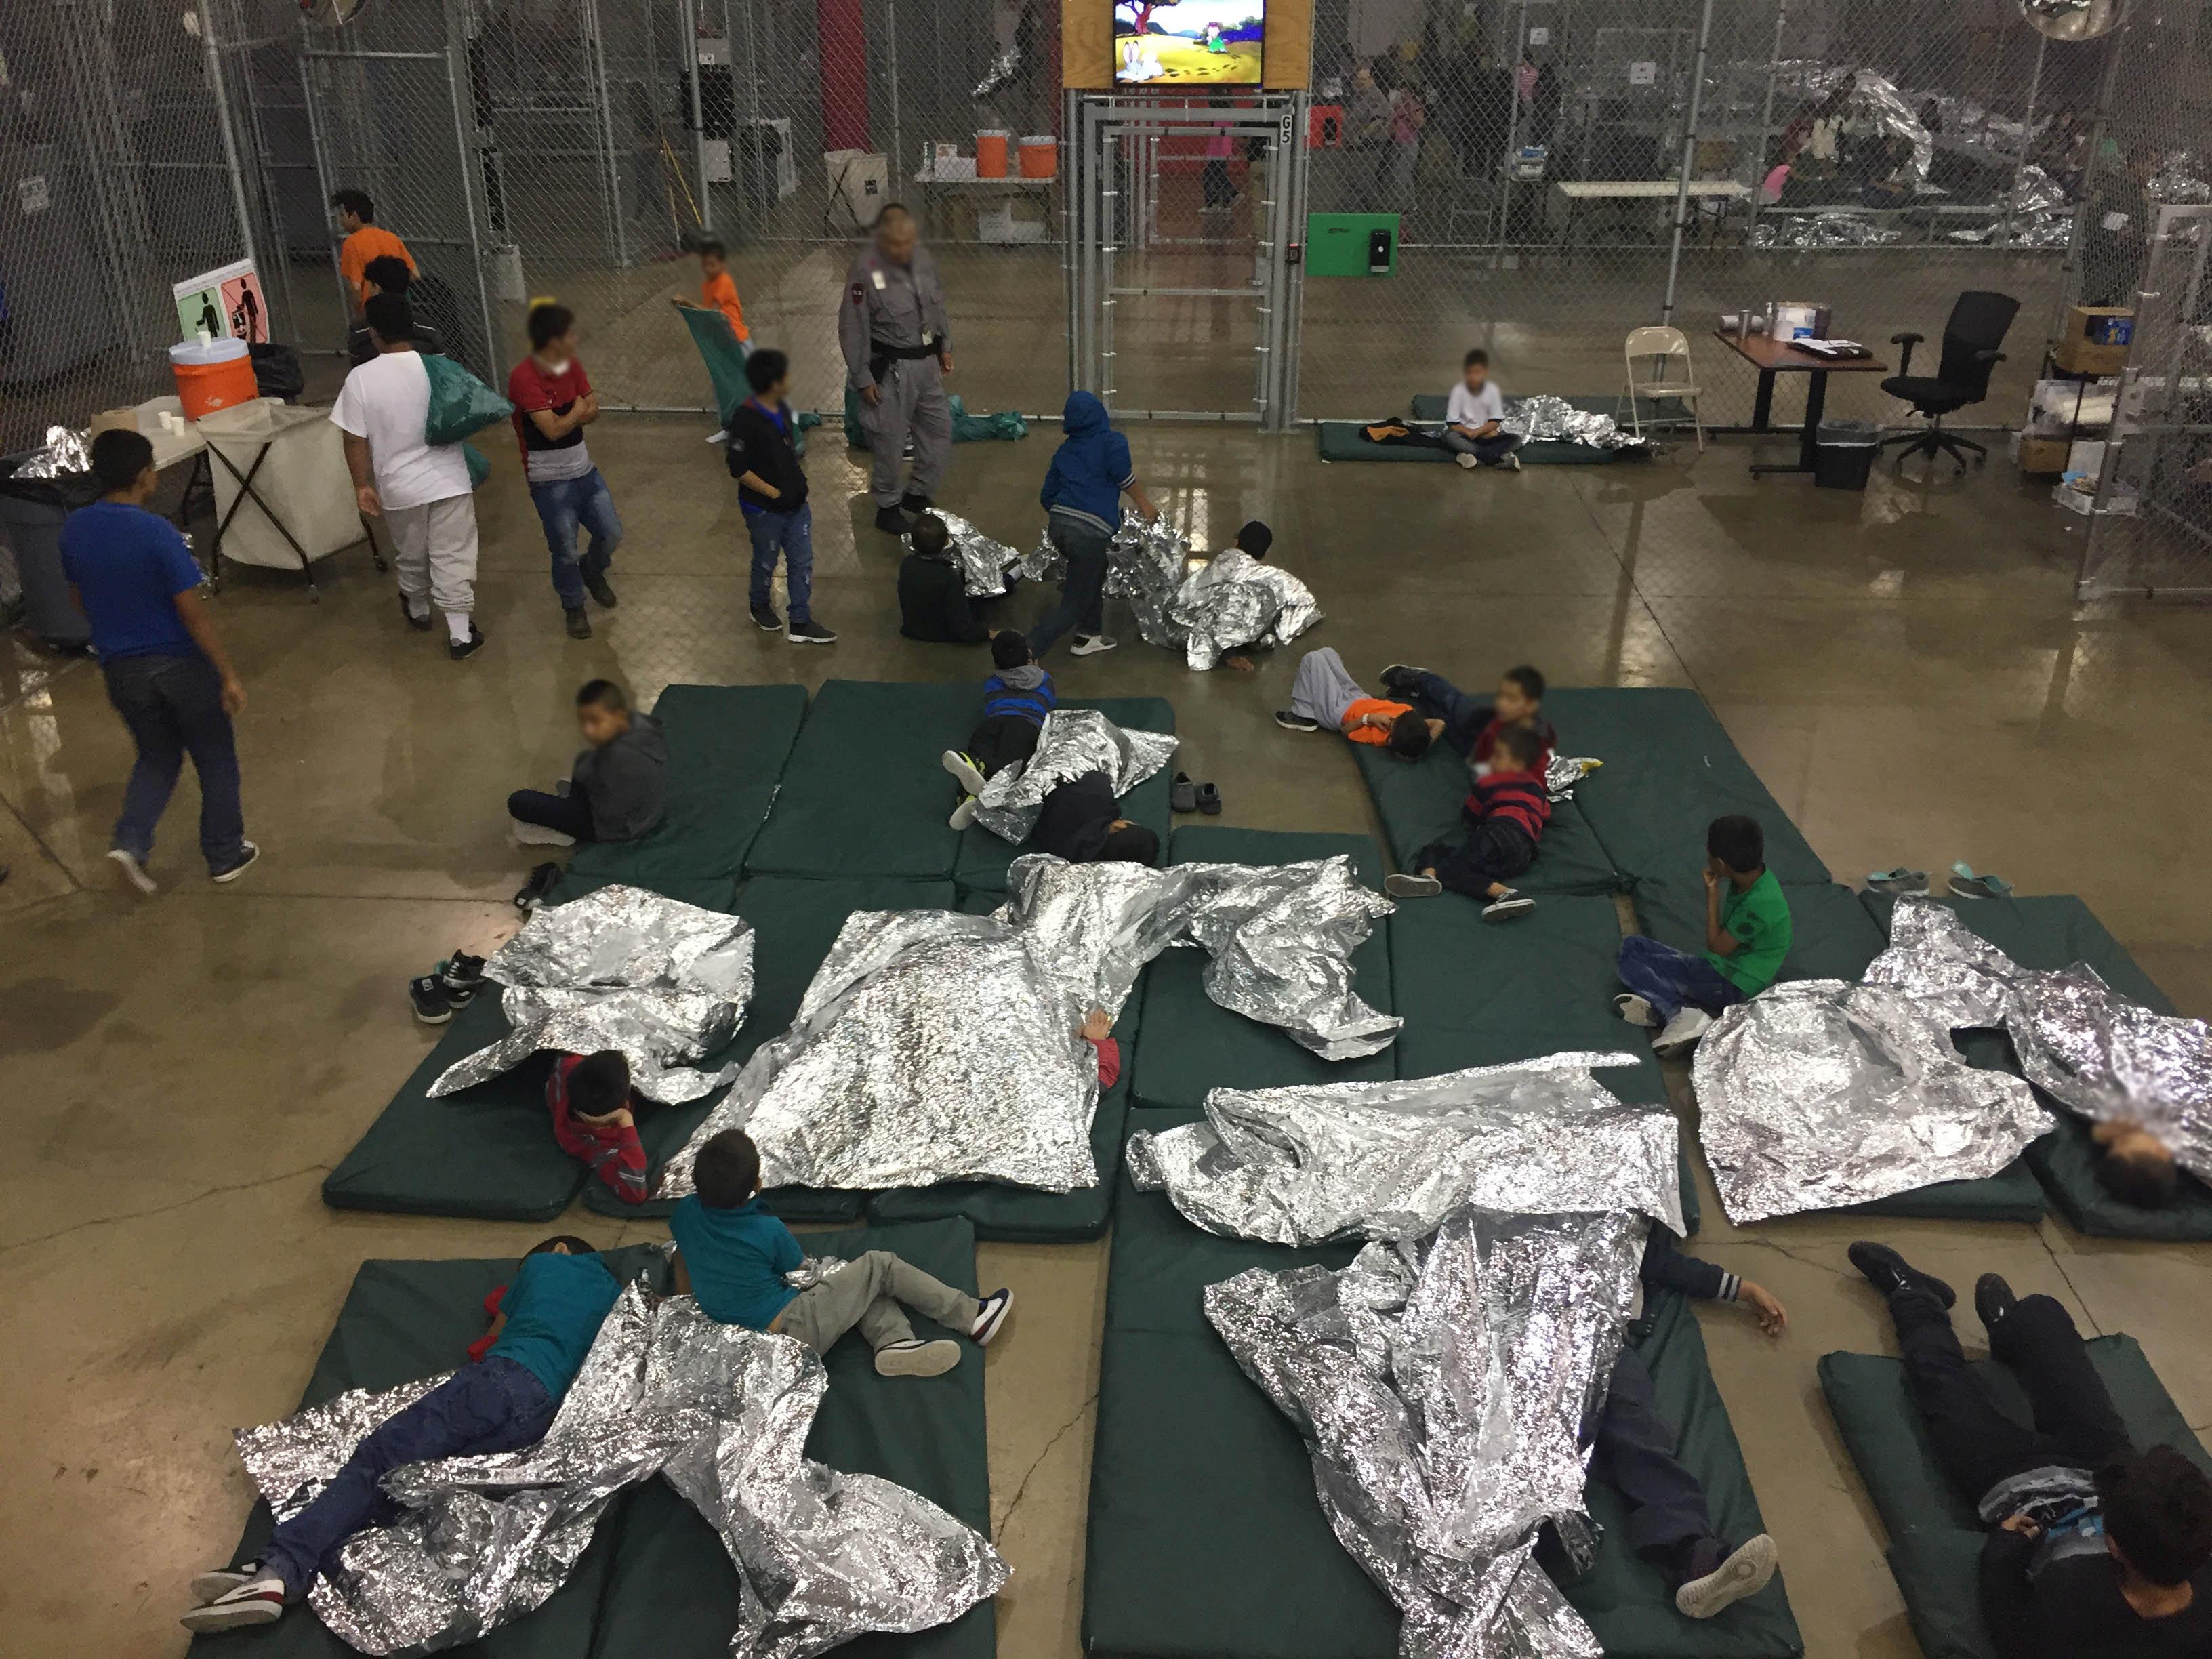 Children at Customs and Border Protection's Rio Grande Valley Centralized Processing Center in Rio Grande City, Texas, on Jun